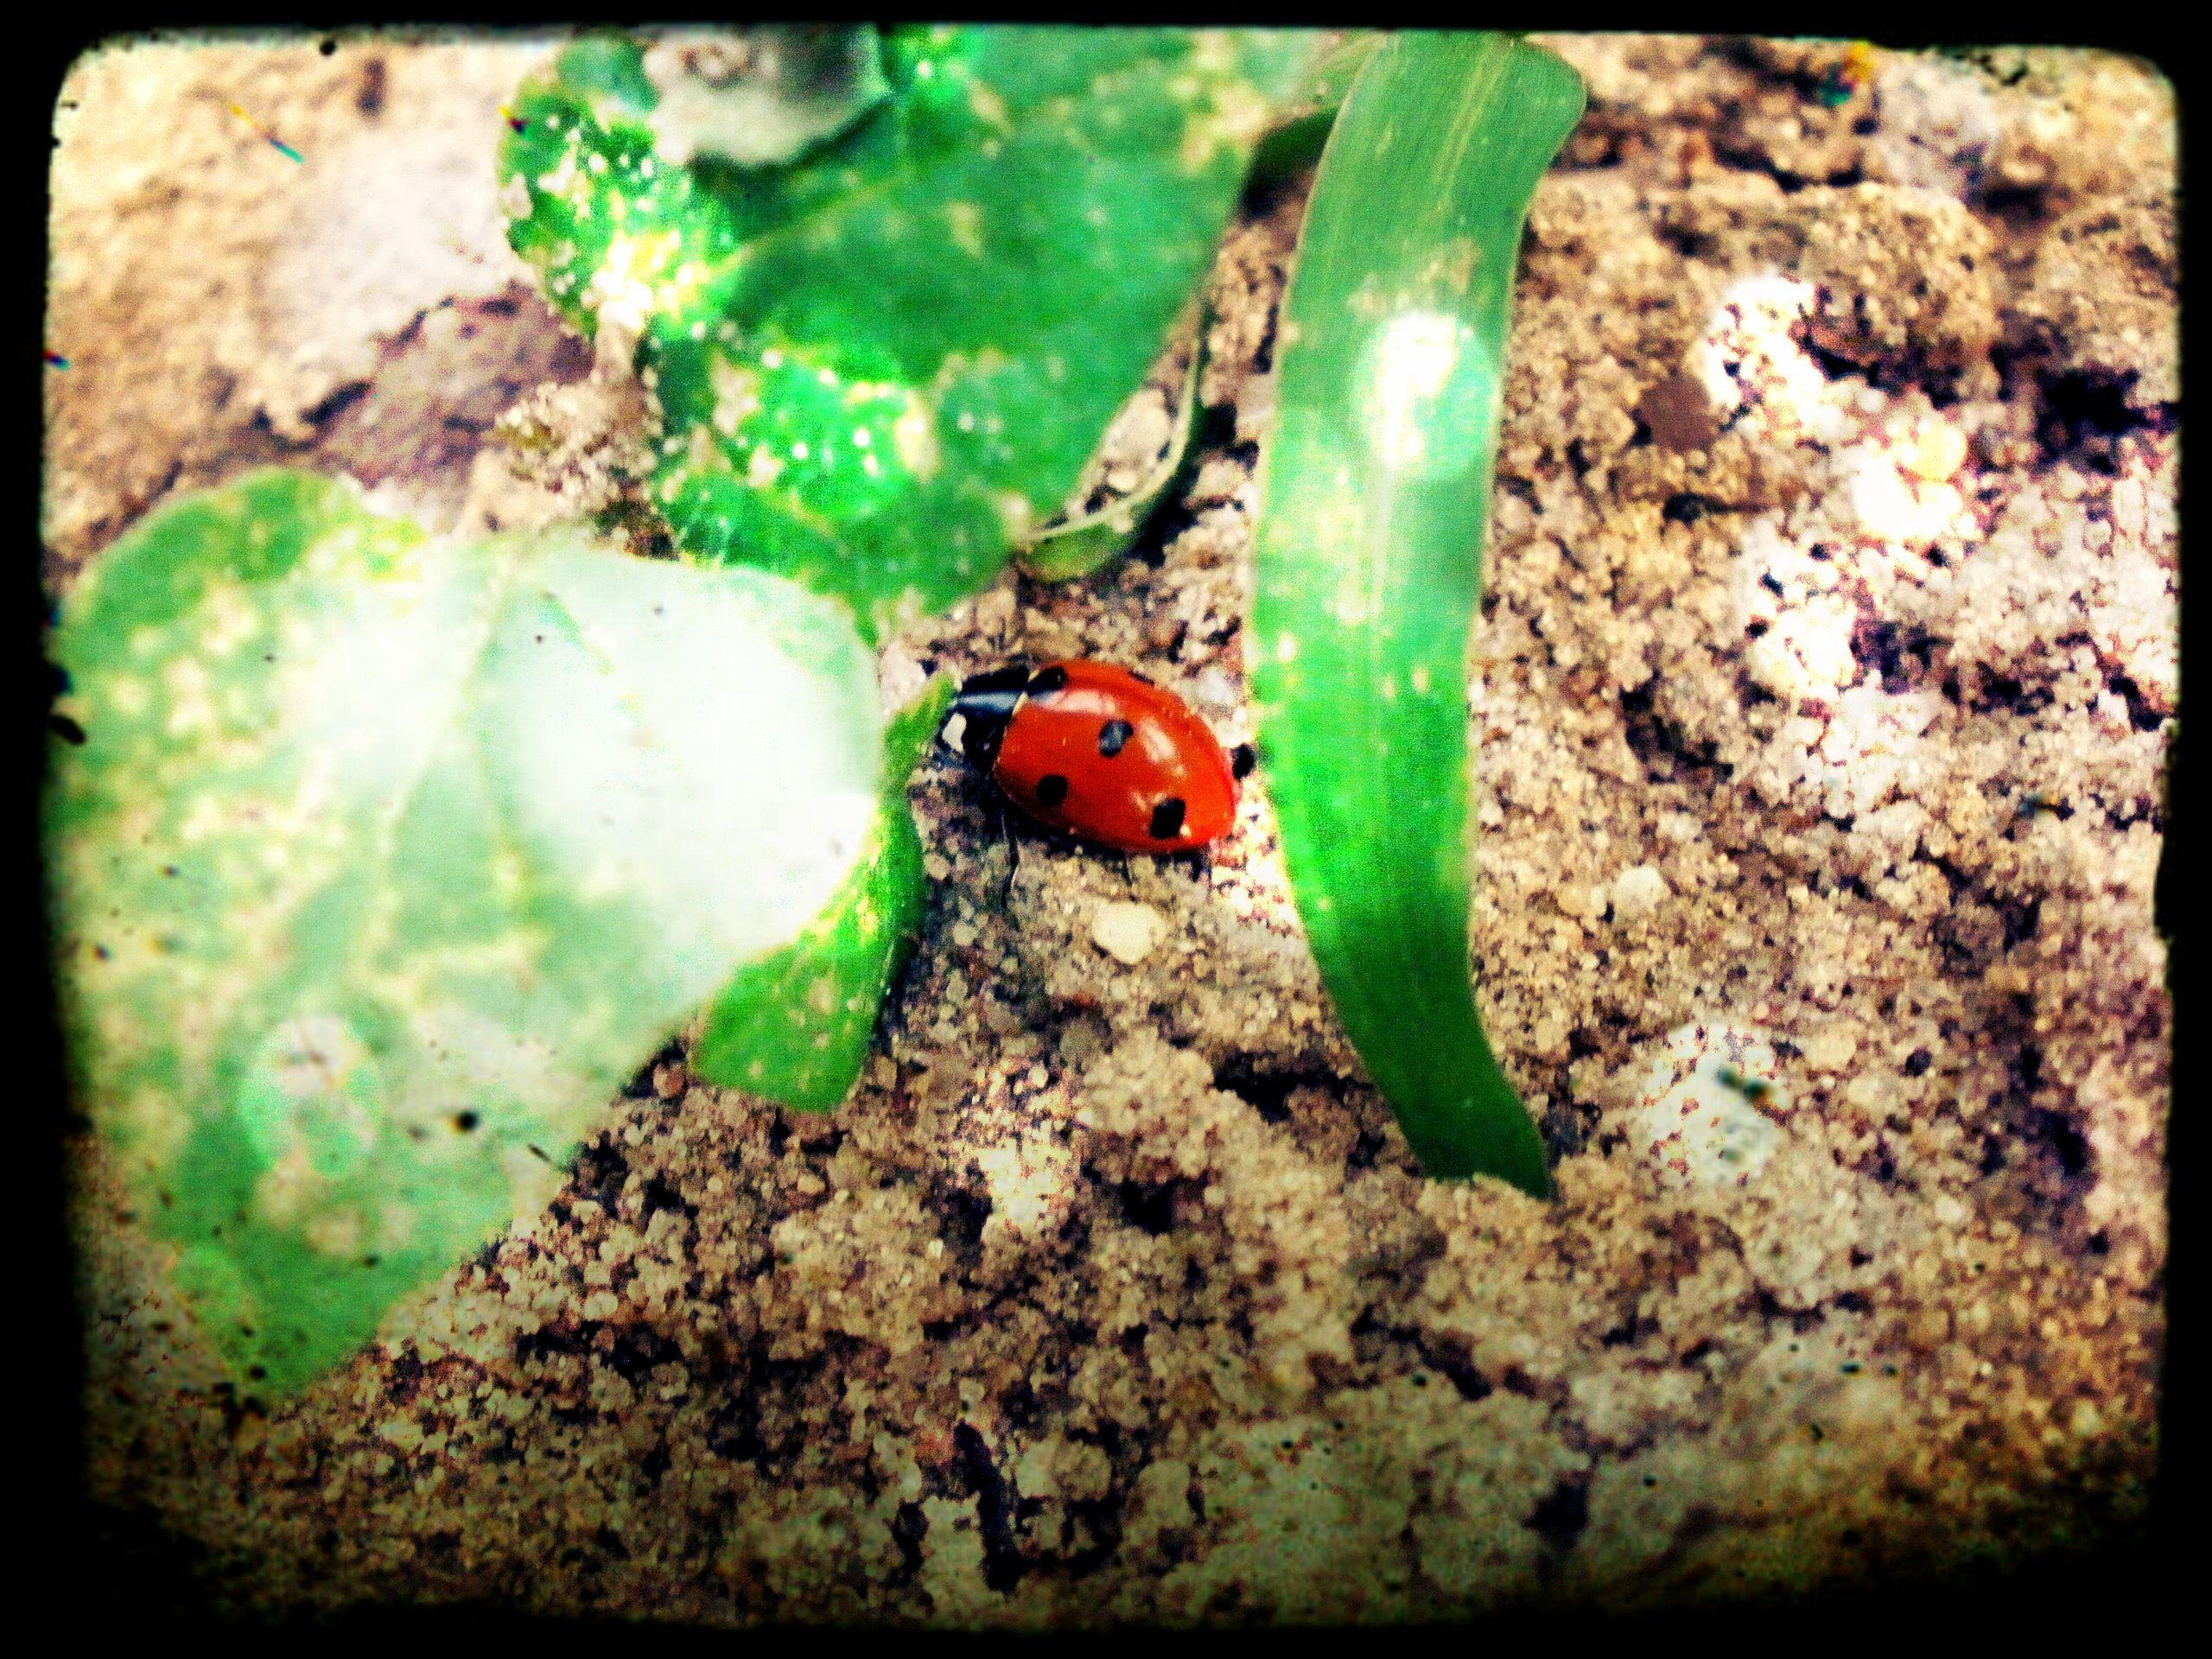 Made this myself, I love ladybugs!